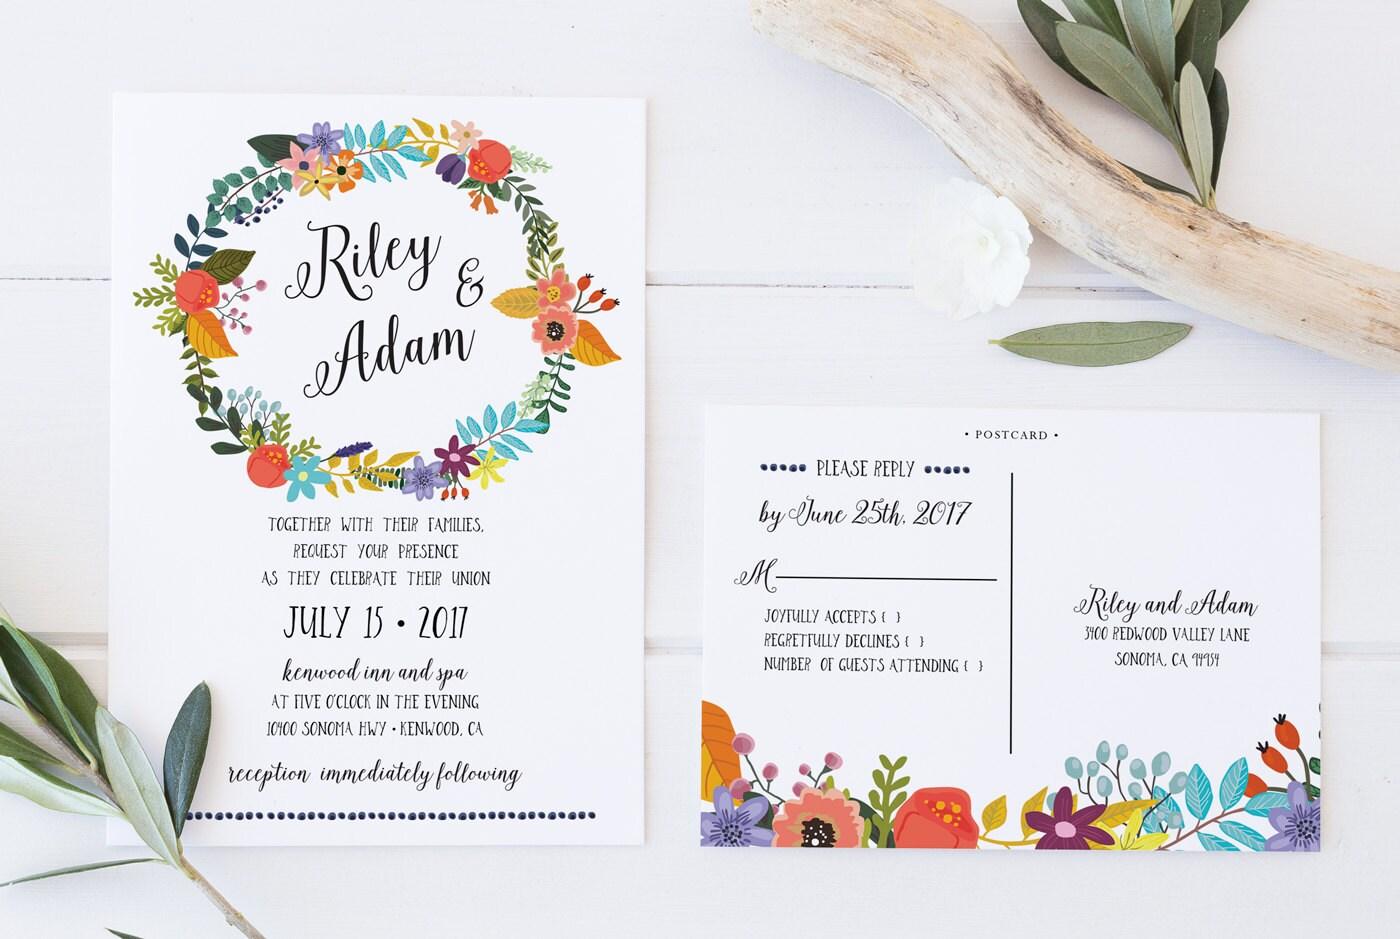 Print Out Wedding Invitations: Boho Wedding Invitation Printable Wedding Invitation Boho